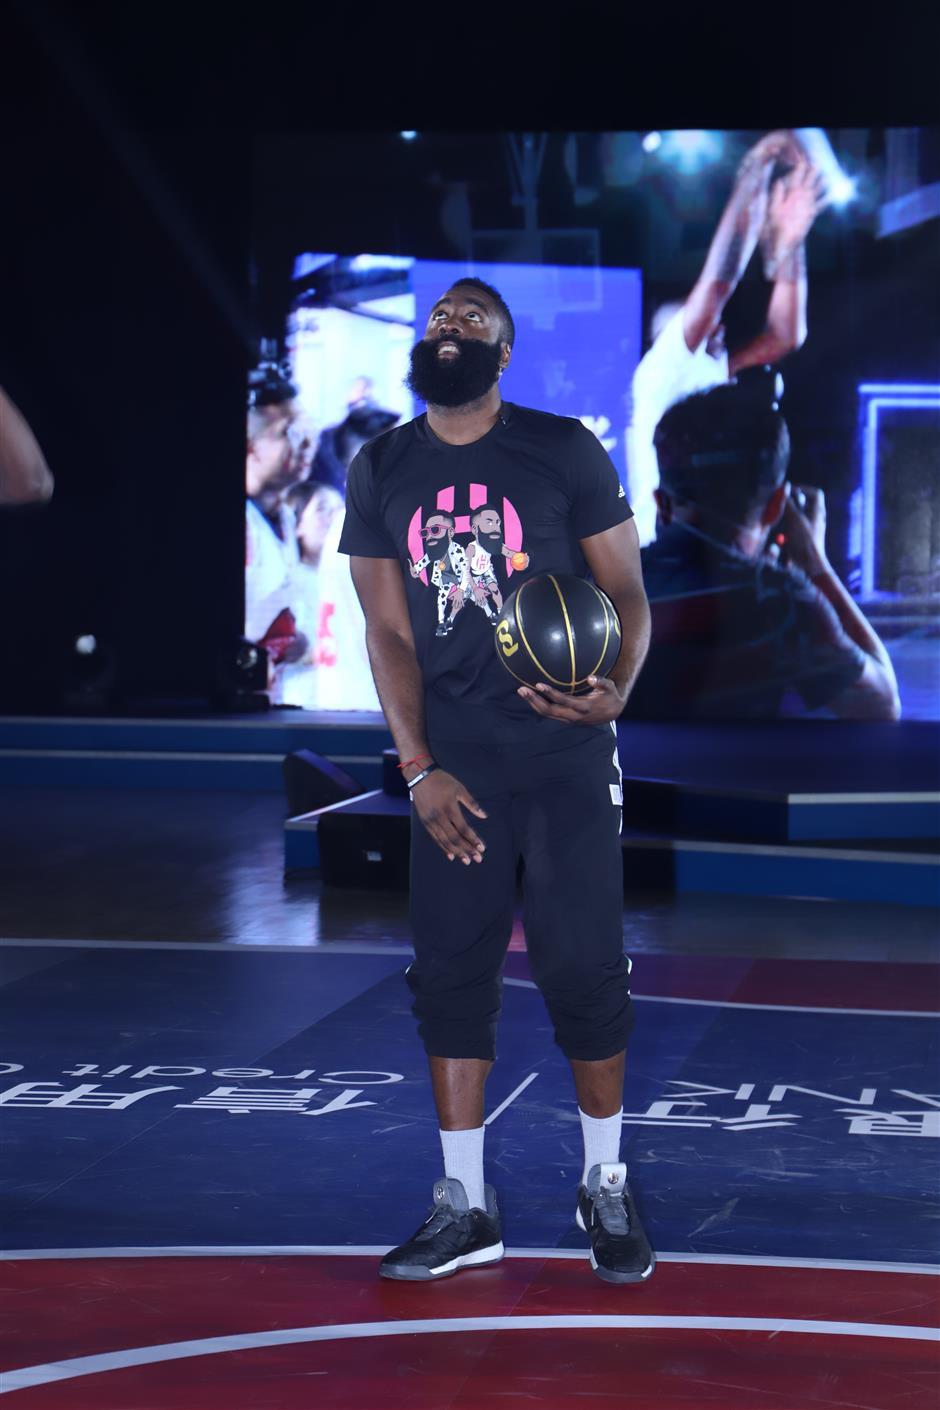 Foul lane:  Rockets' Harden apologizes for Shanghai traffic violation